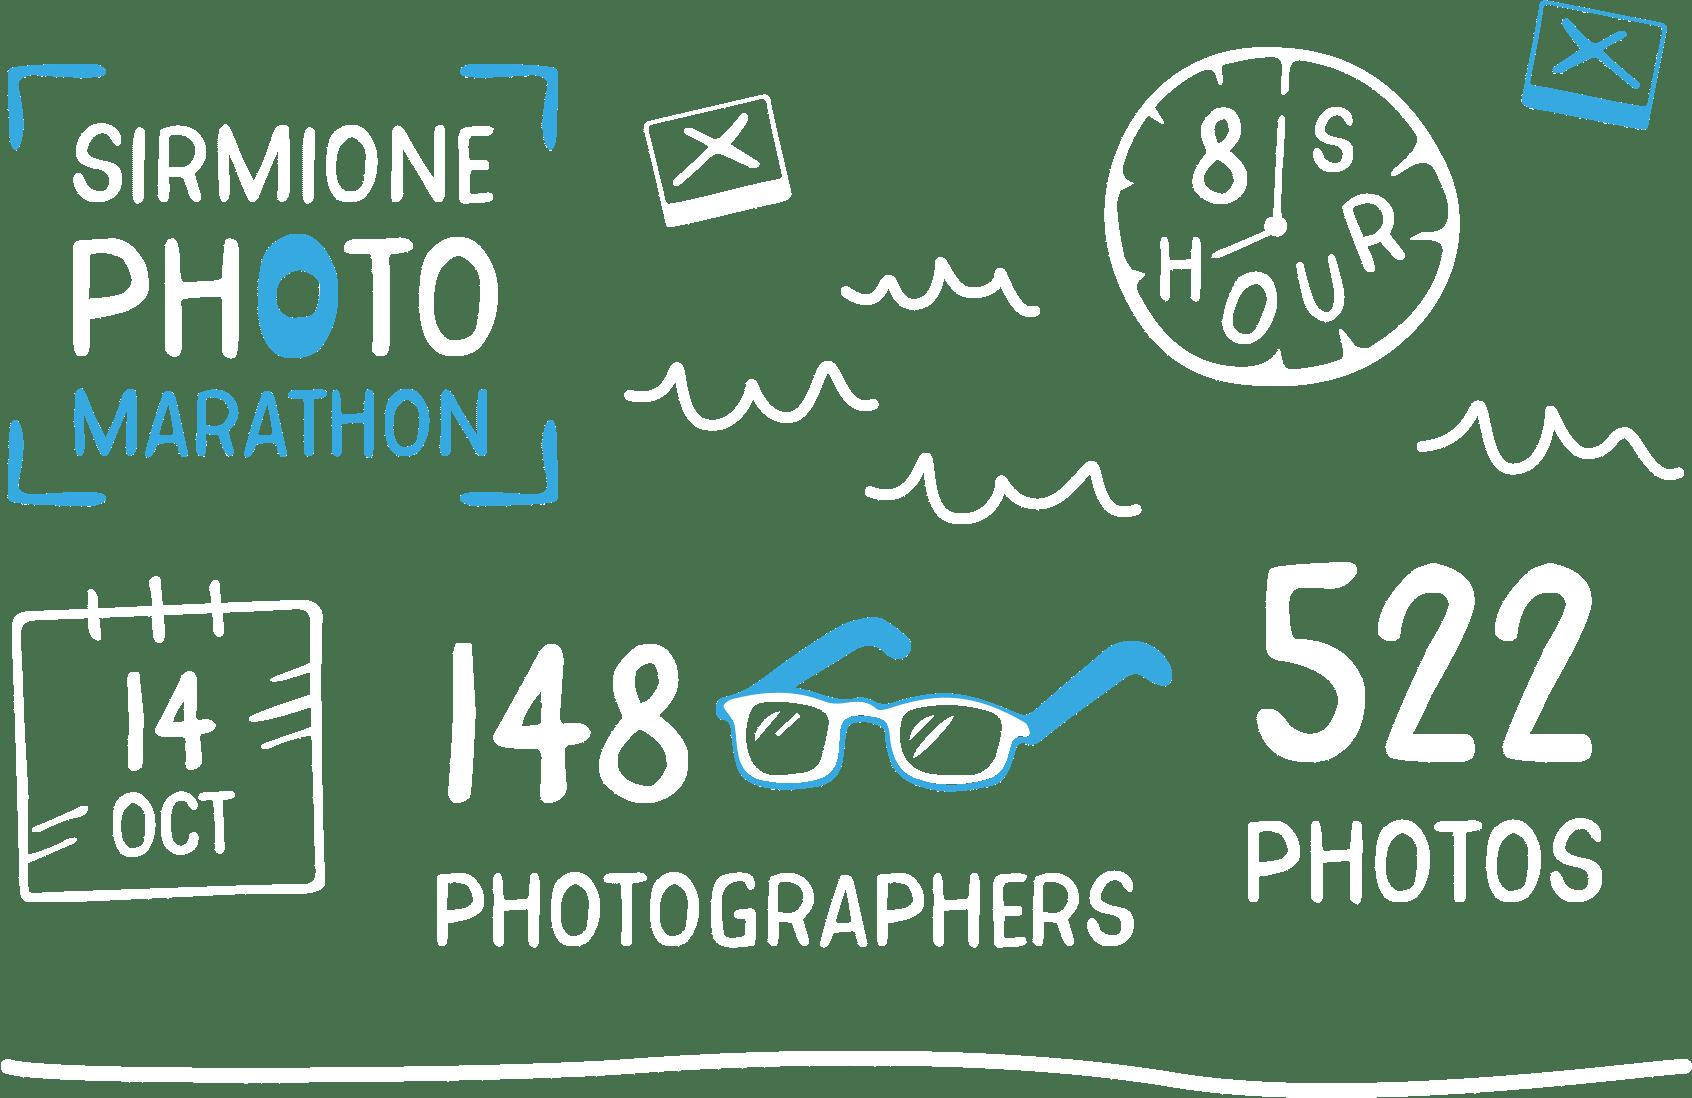 sirmione photo marathon 522 photos 150 photographers